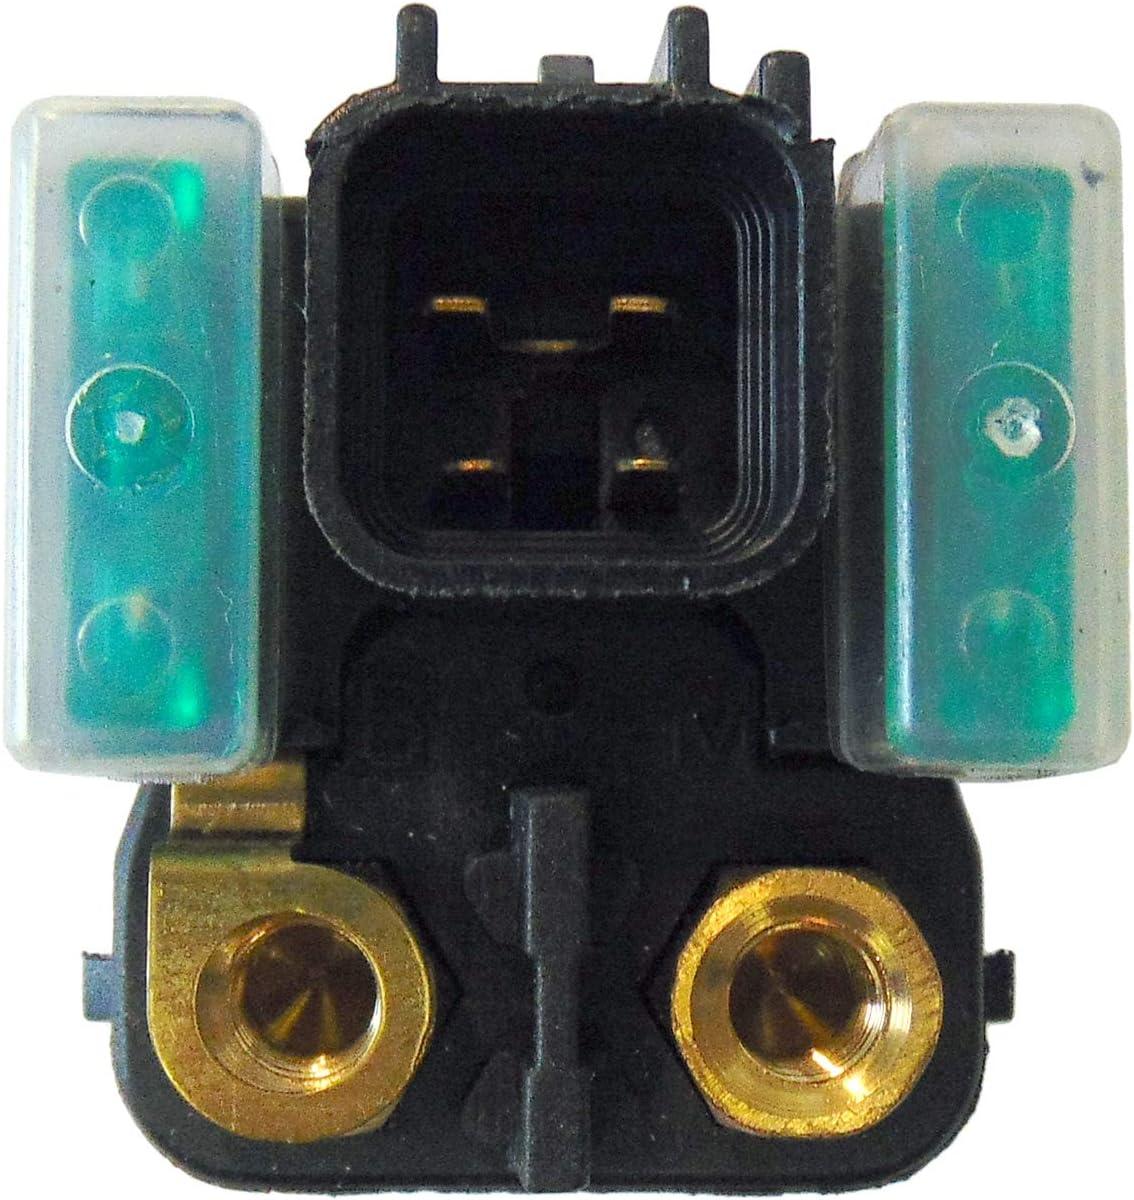 Electrical Starter Solenoid Relay Solenoid For Yamaha Rhino YXR 660 YXR660